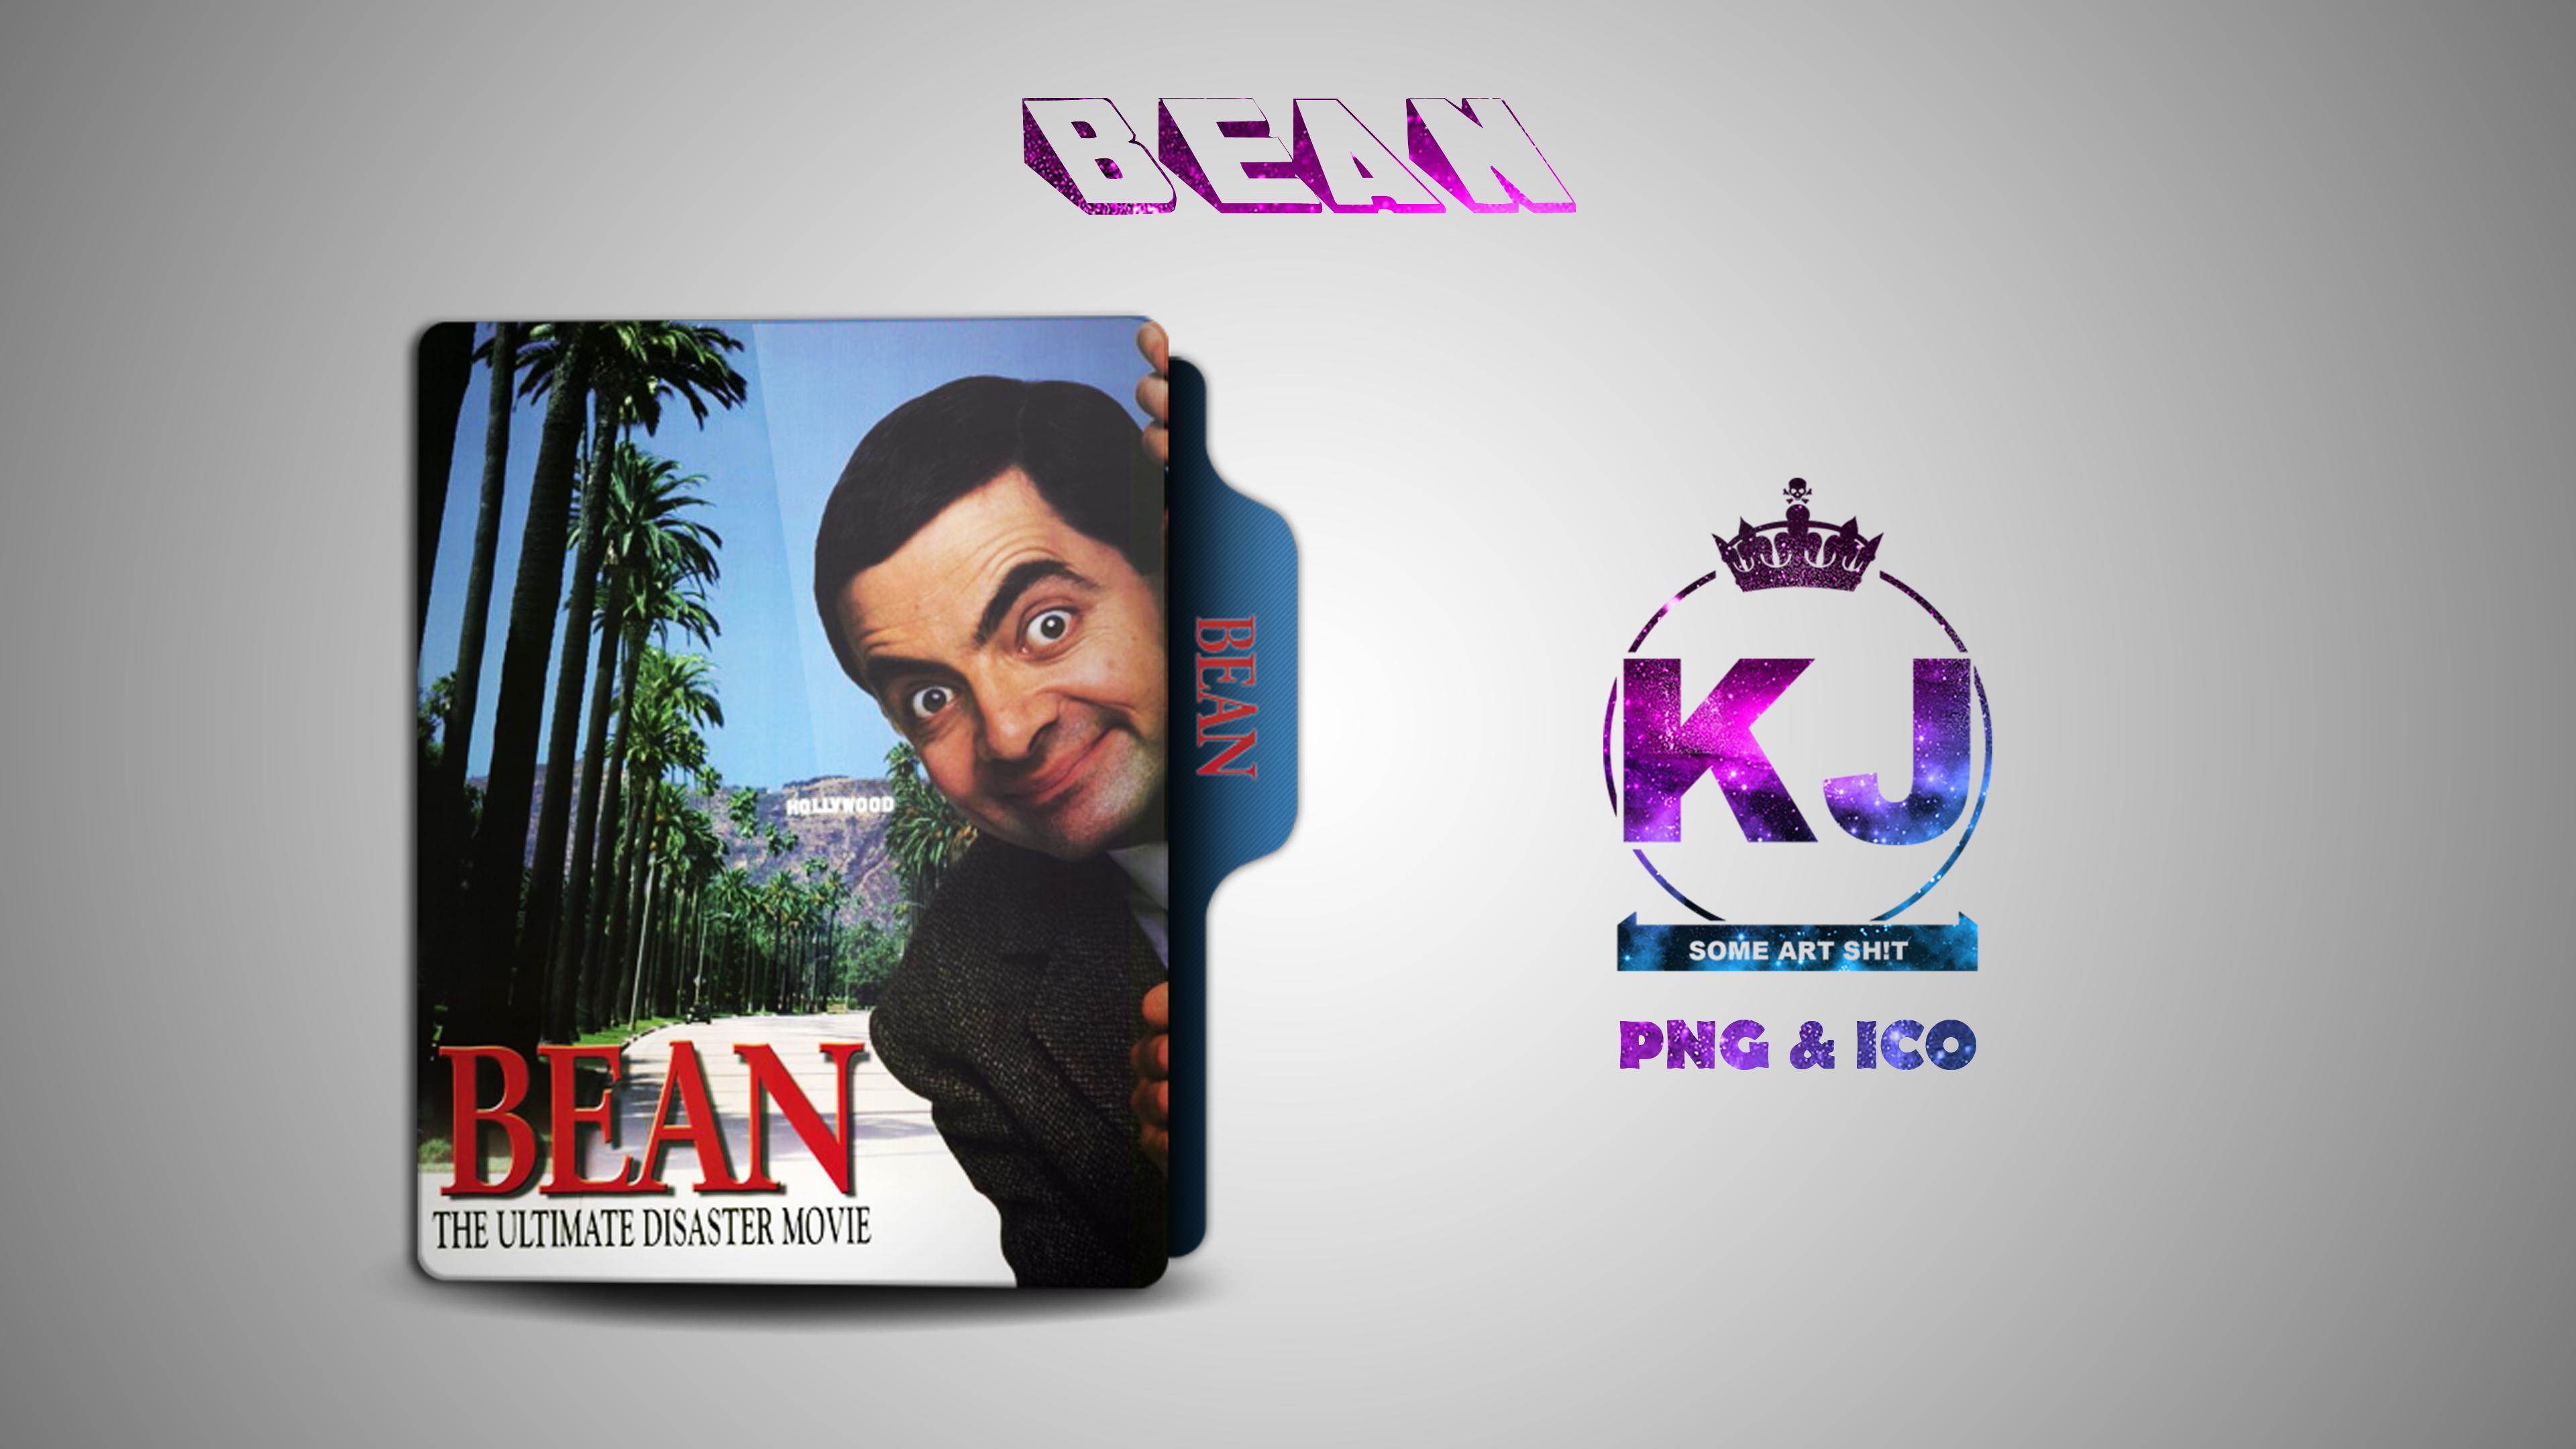 Bean 1997 Folder Icon By Kingjoe93 On Deviantart